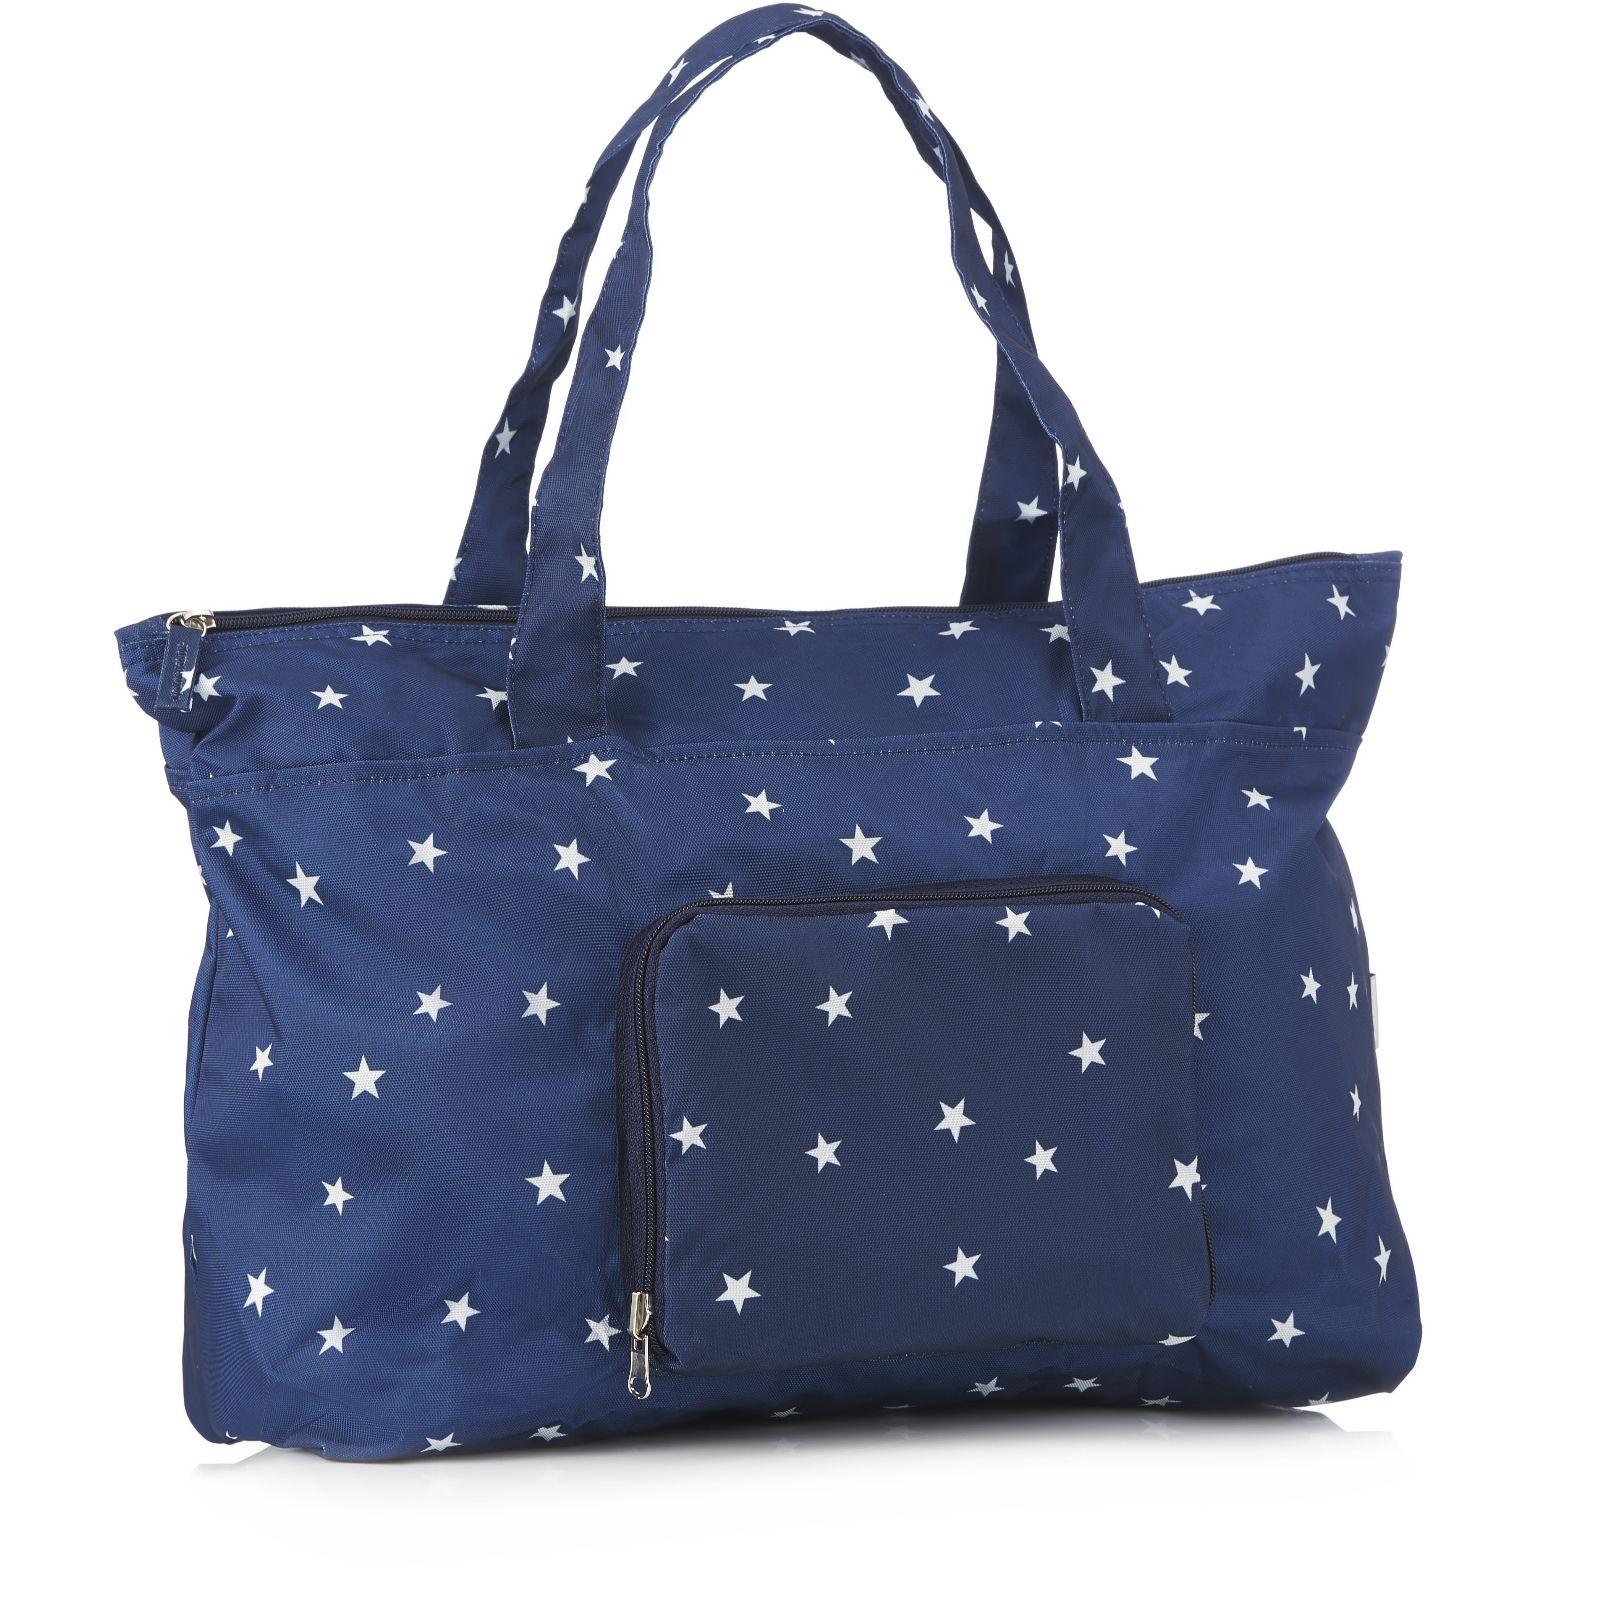 0706aa5fb2 Mia Tui Alex Folding Travel Bag - QVC UK